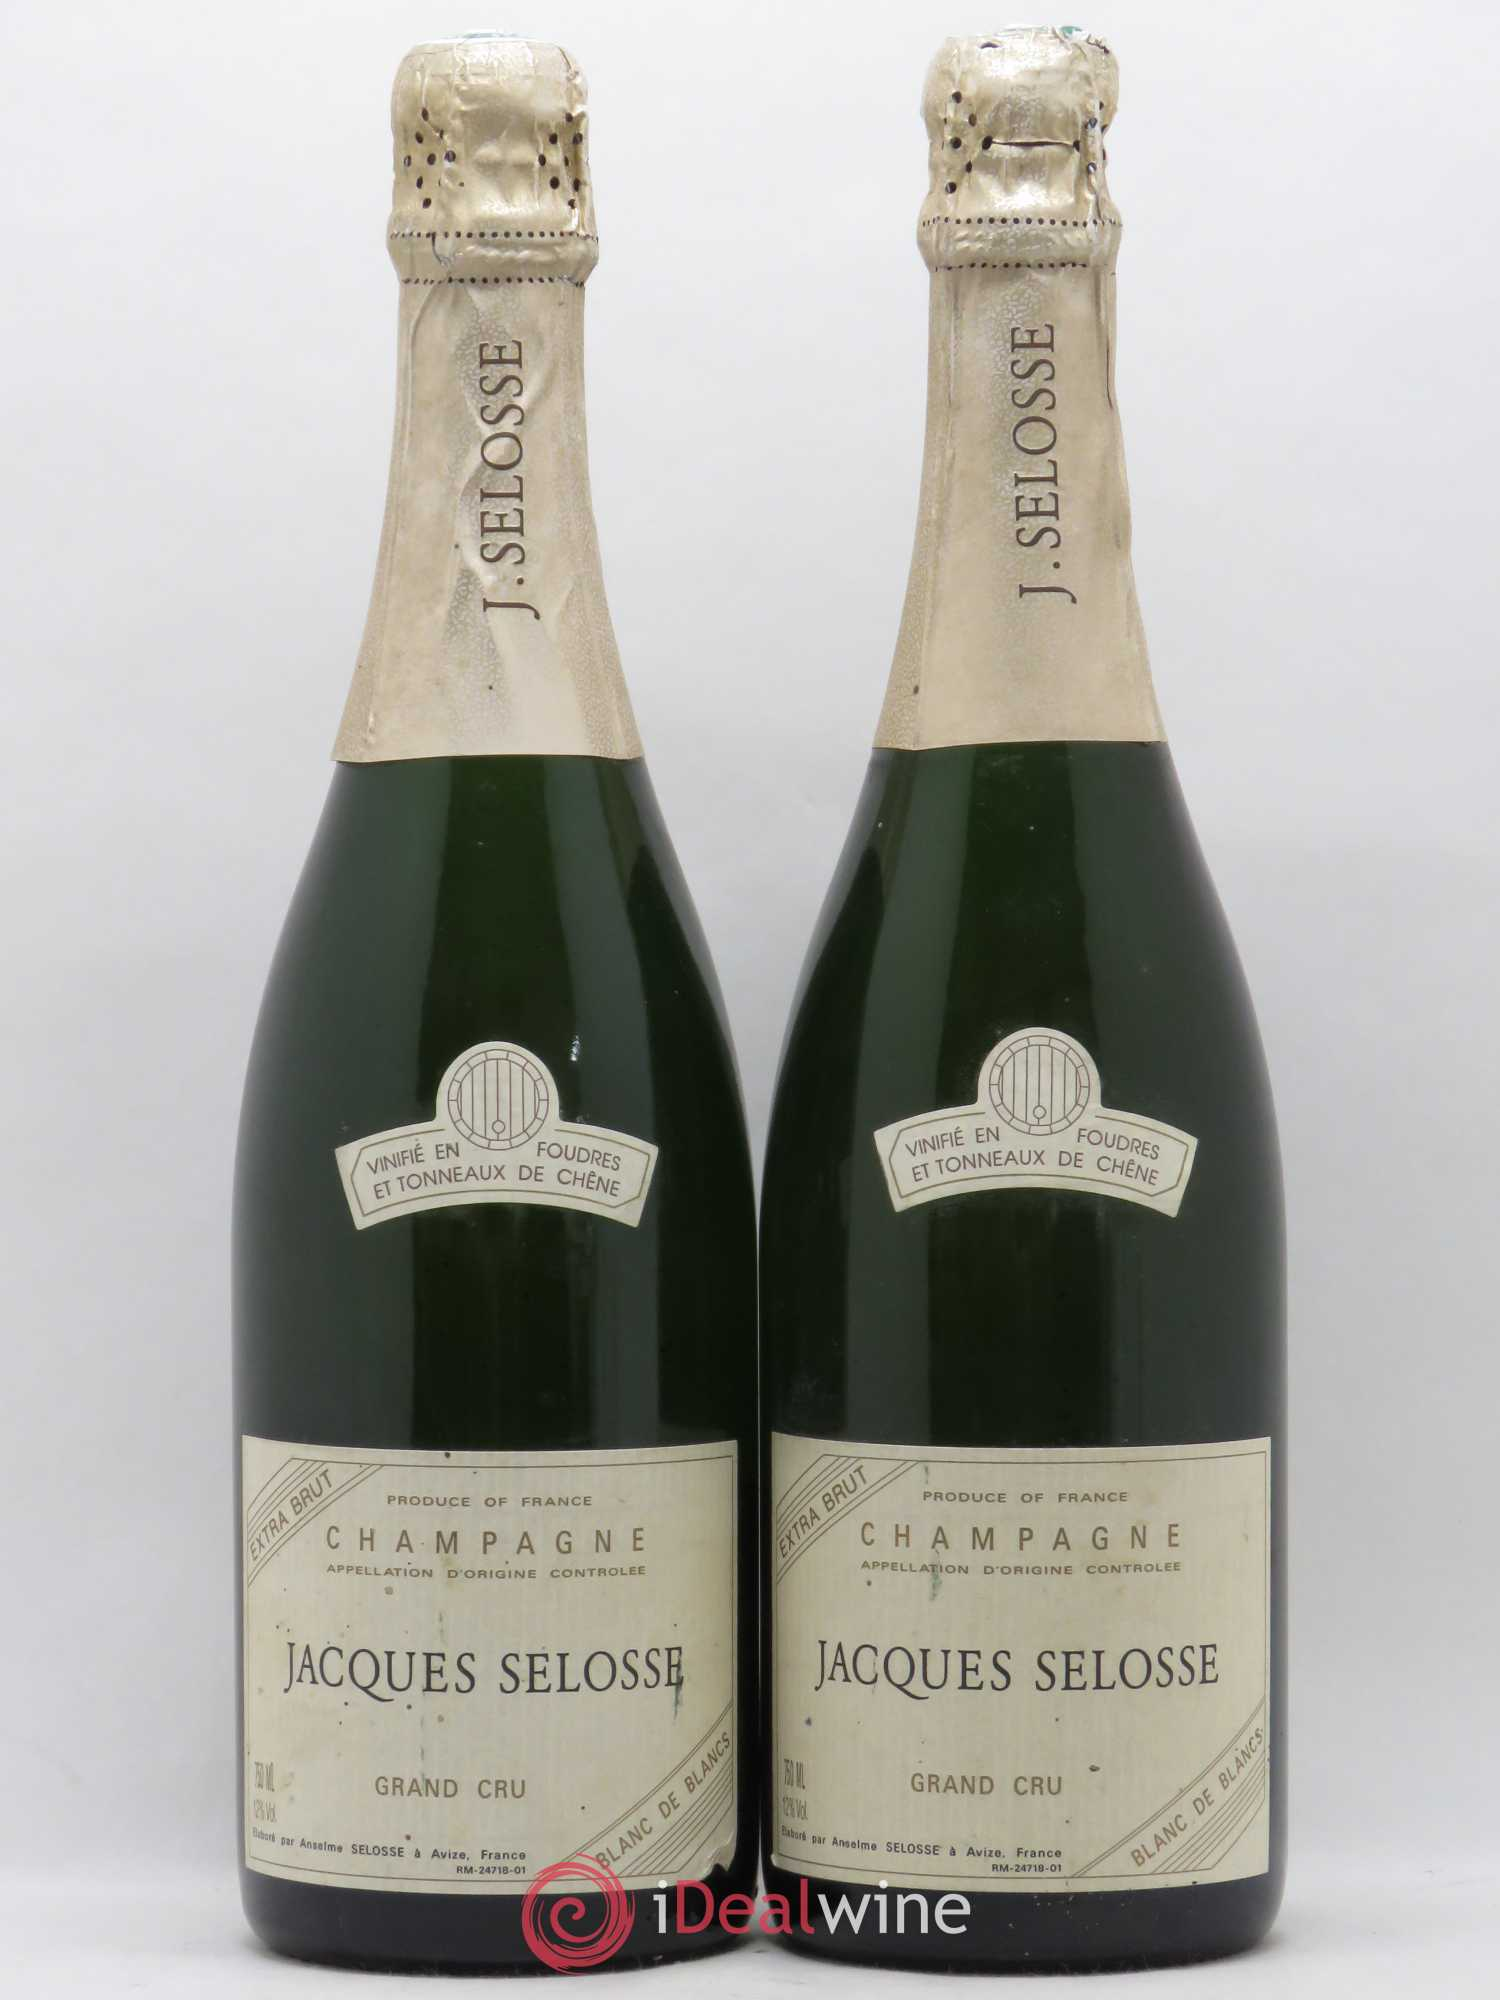 Capsule de champagne AVIZE 9. A